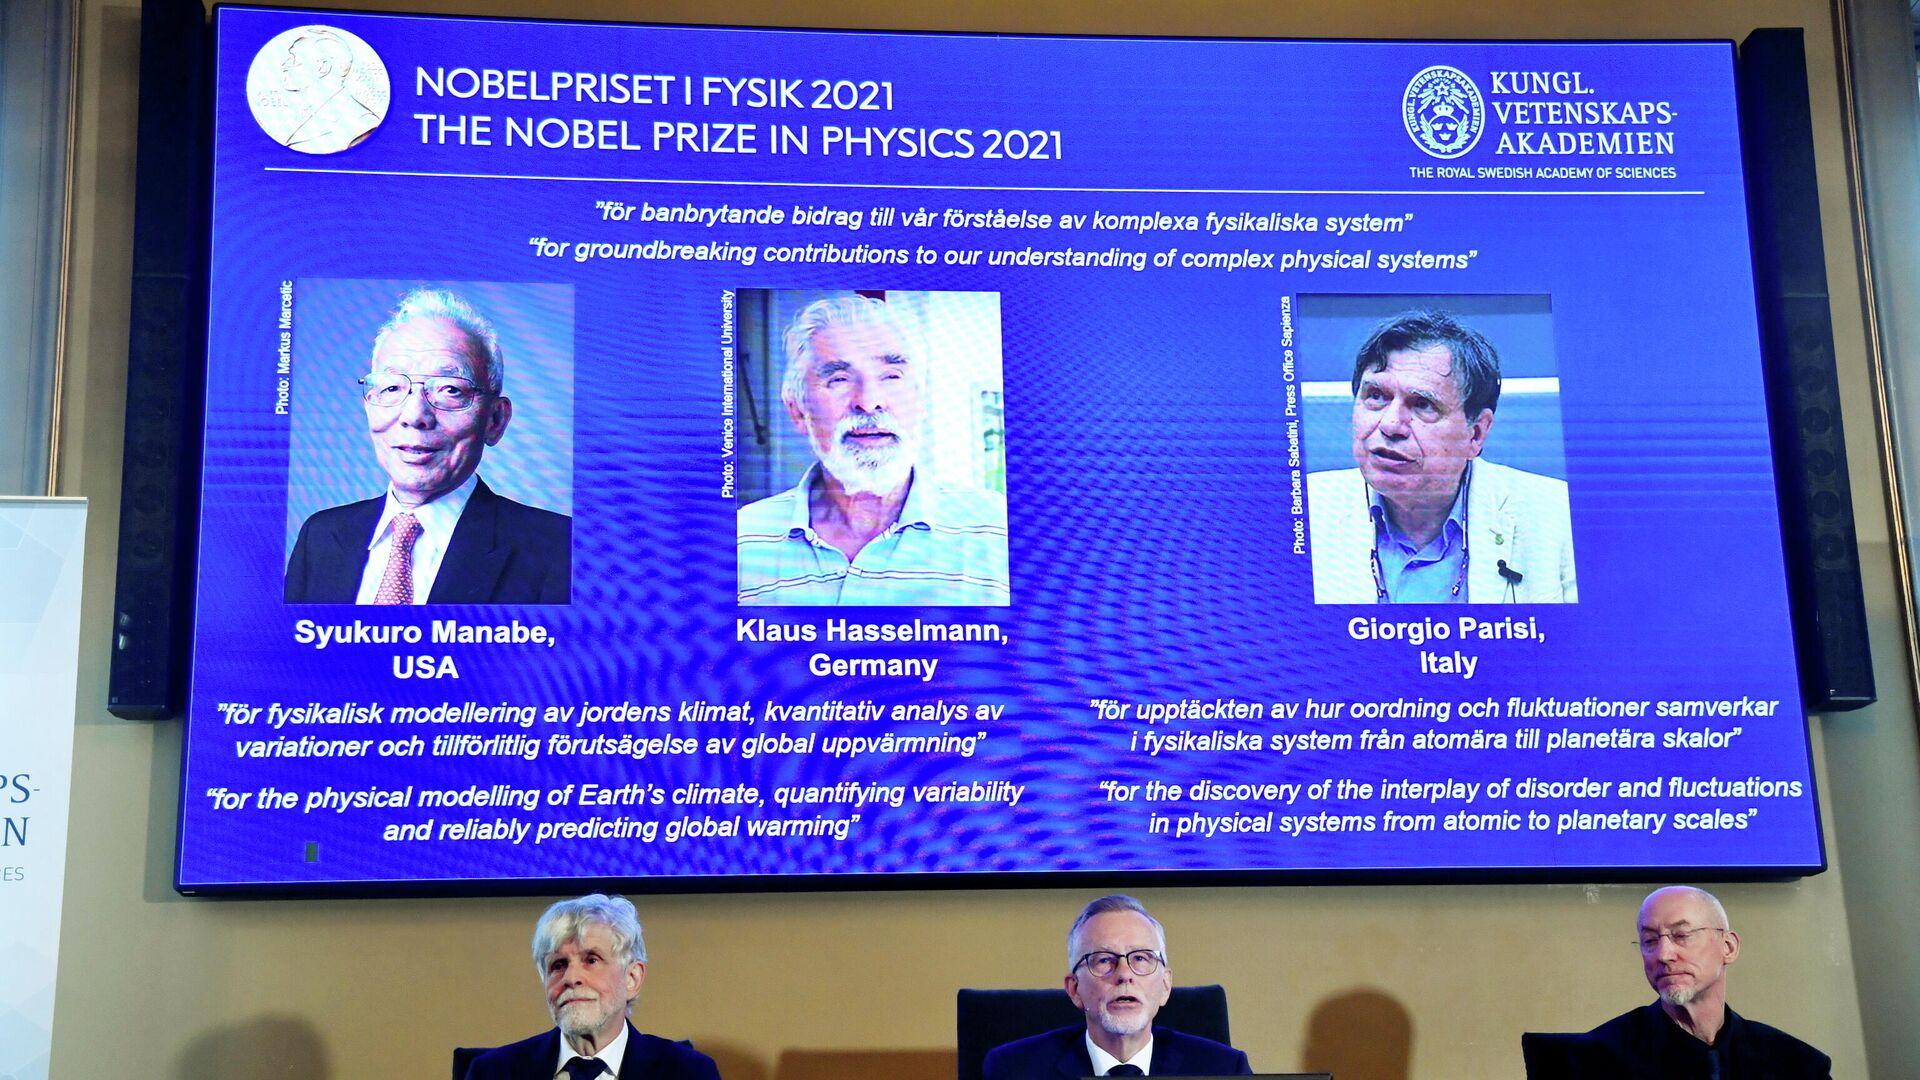 El Premio Nobel de Física 2021 - Sputnik Mundo, 1920, 05.10.2021